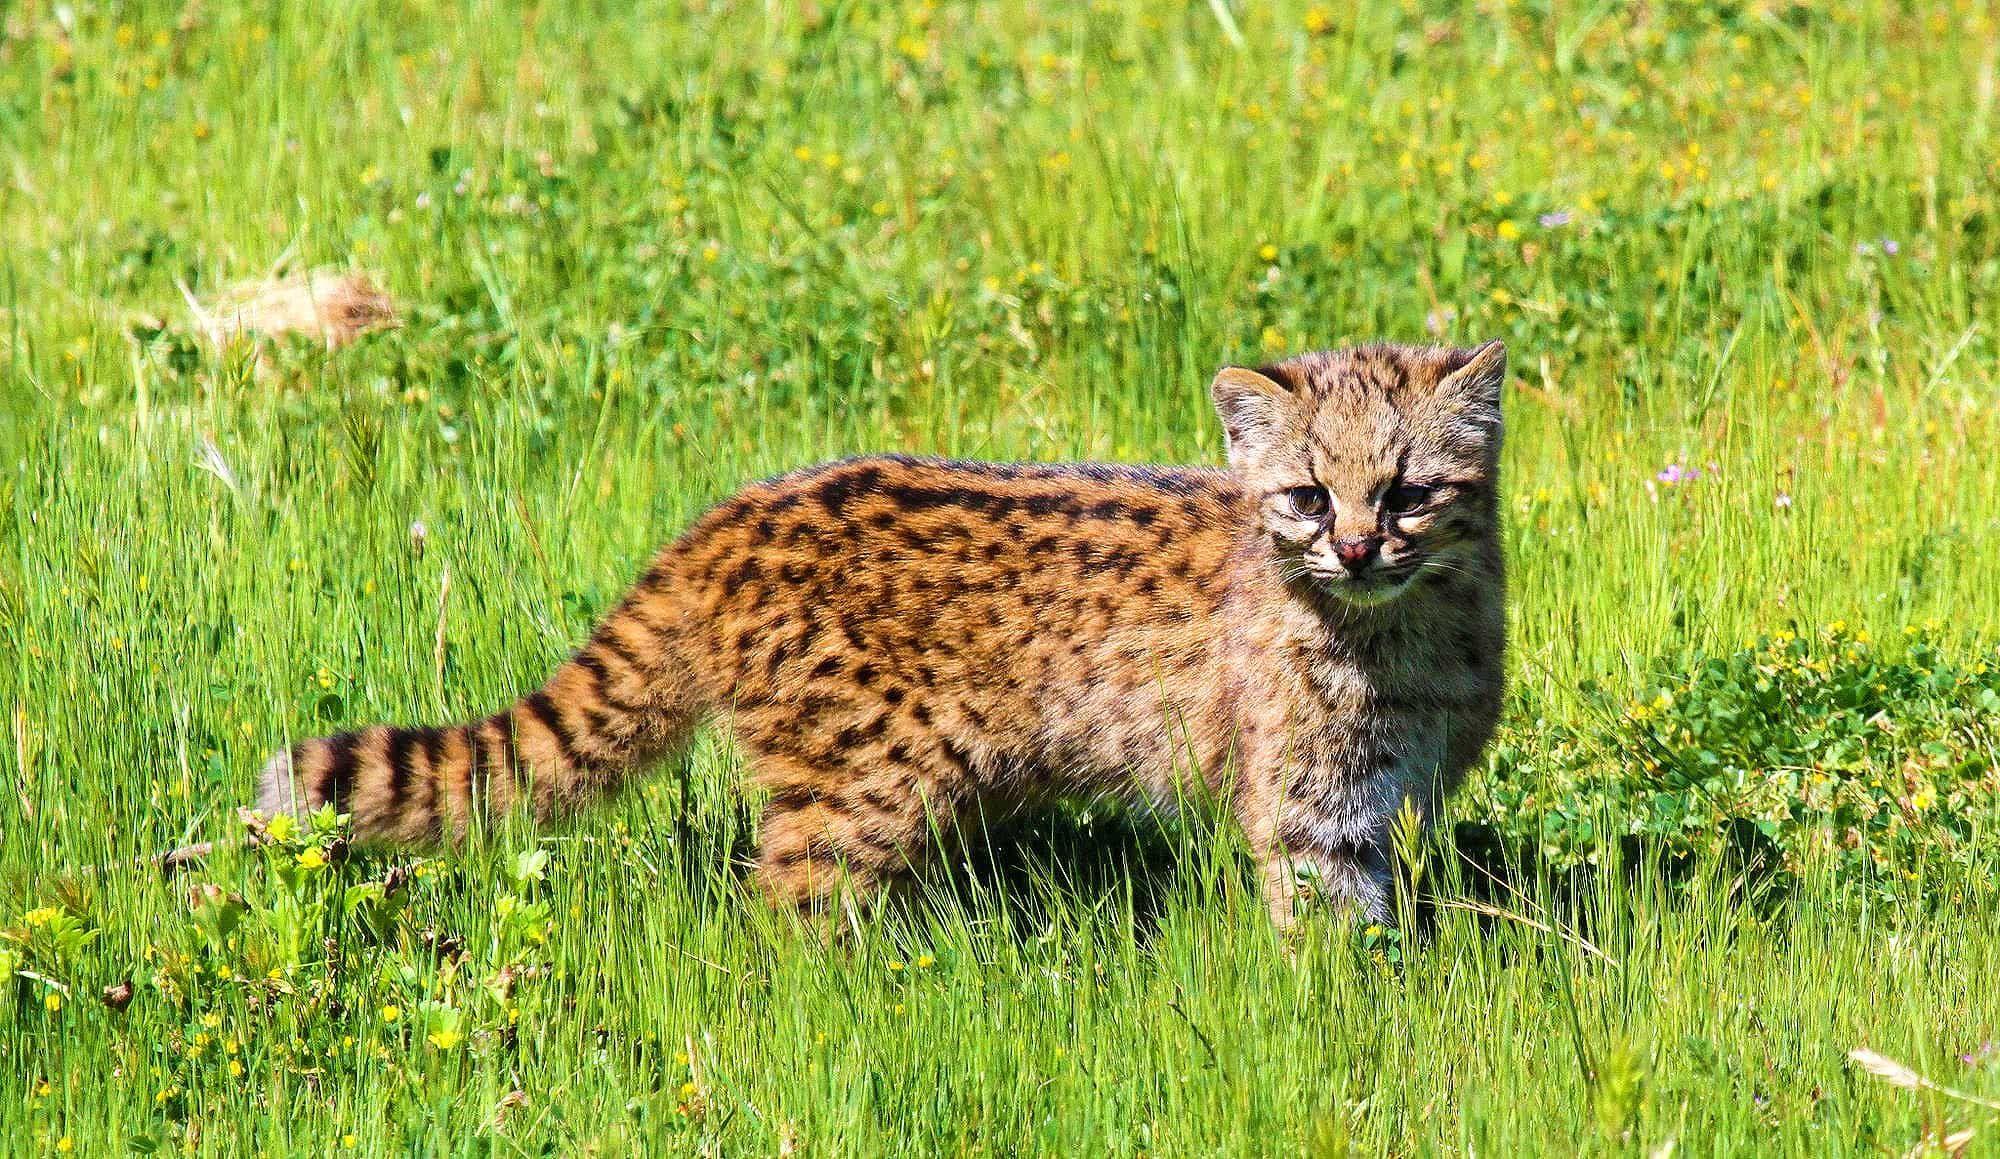 Kodkod a rare species of wild cat Rare cat breeds